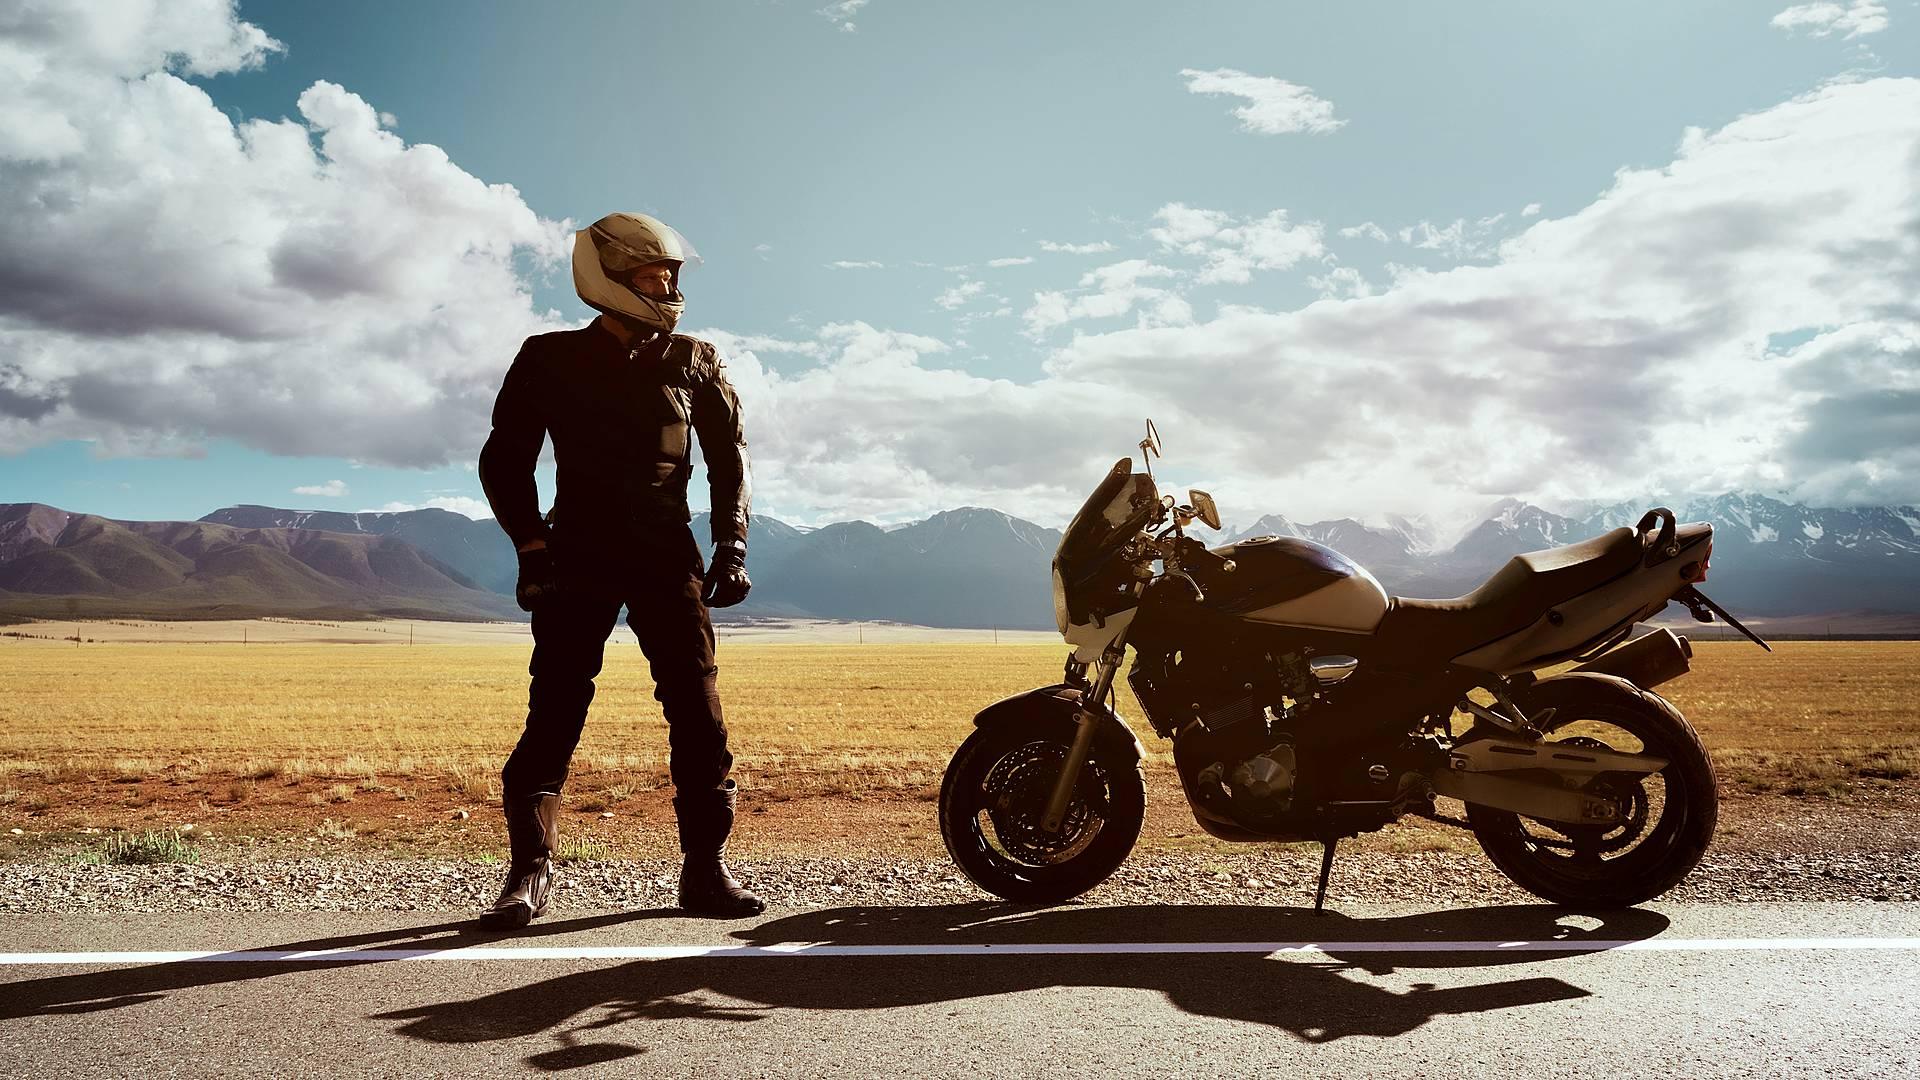 Avventura in moto: dal deserto alle montagne del Marocco